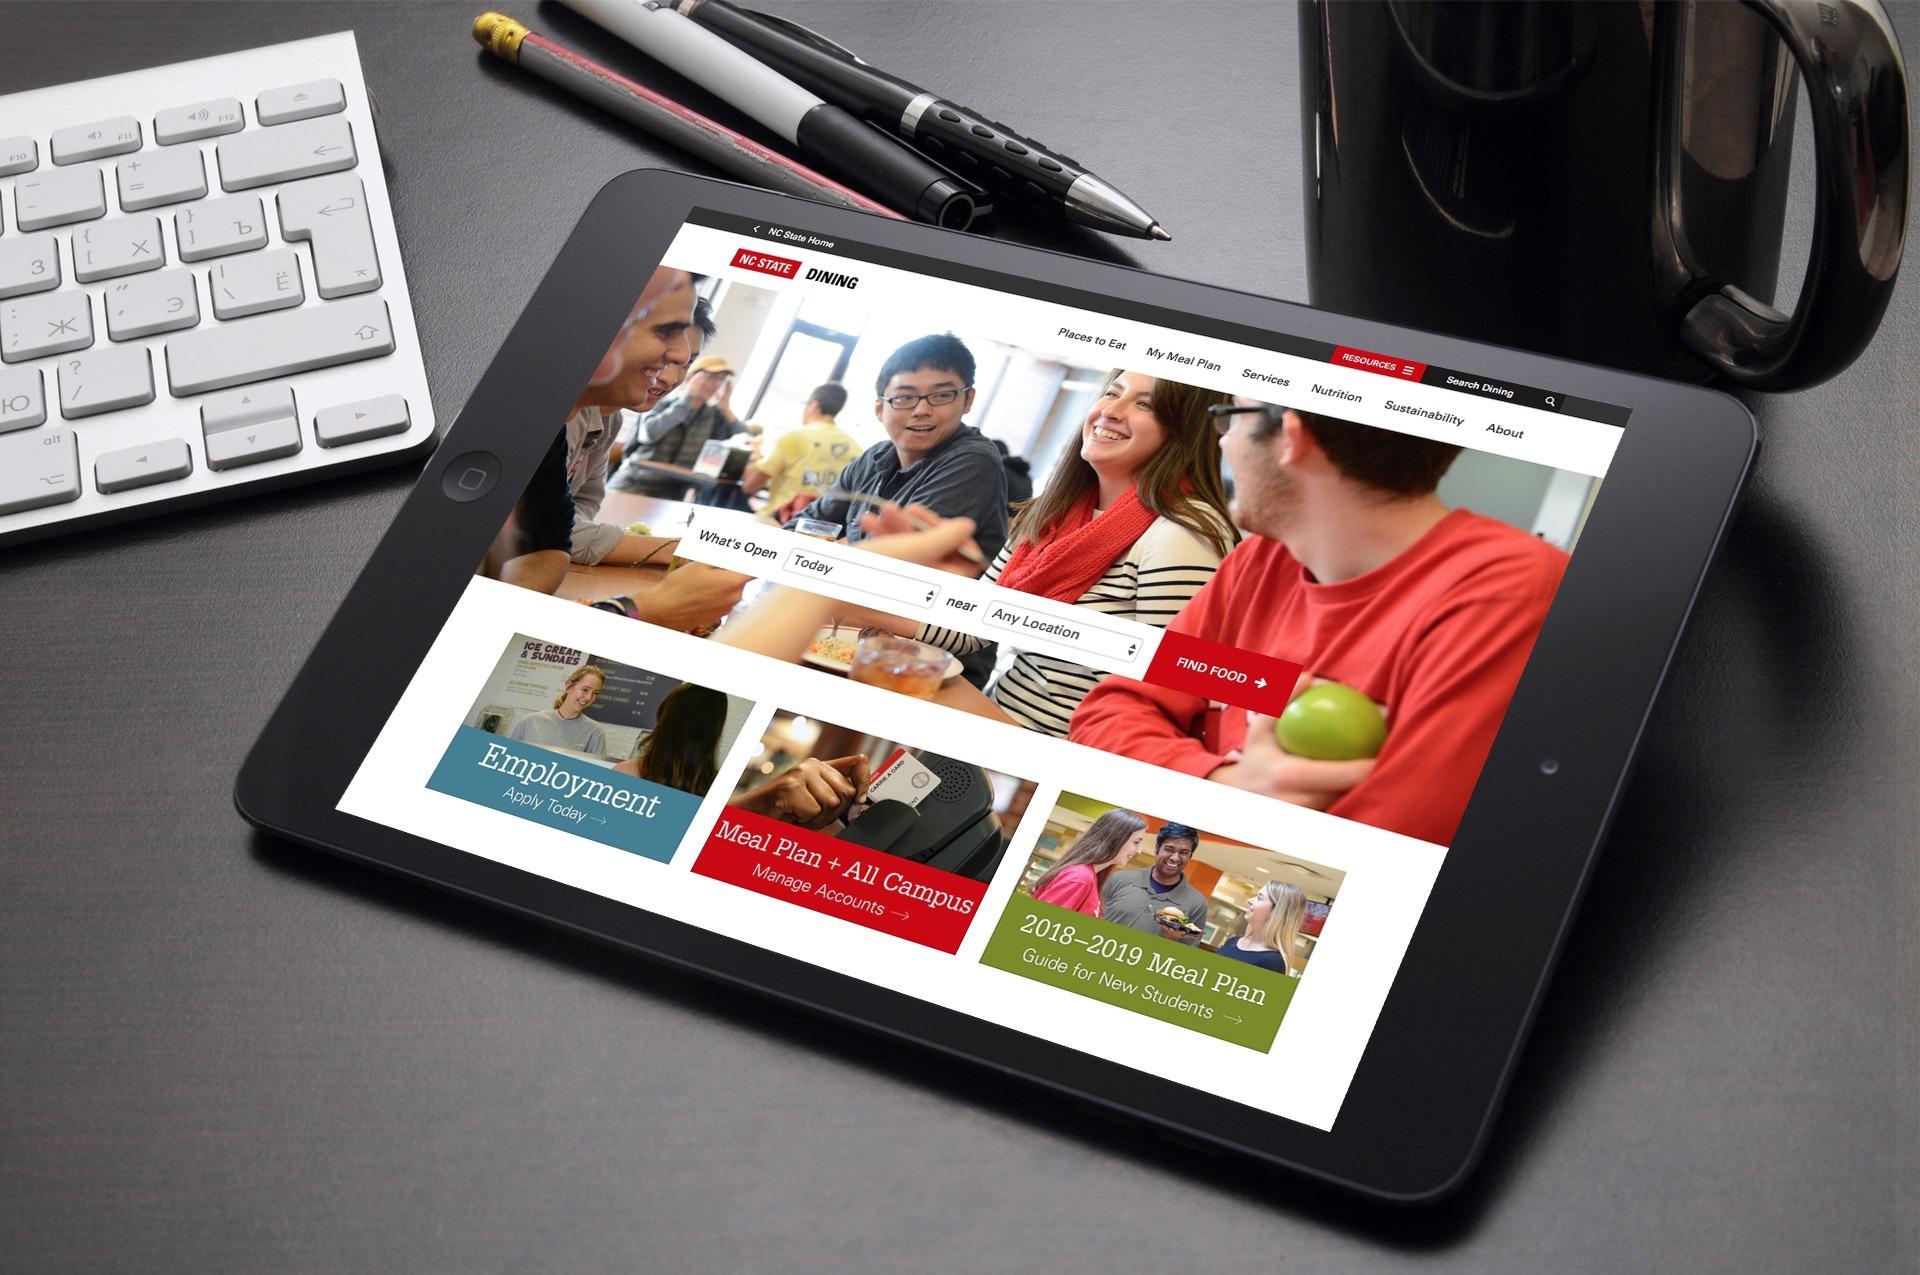 NCSU dining tablet smartmockups_jkq1helm